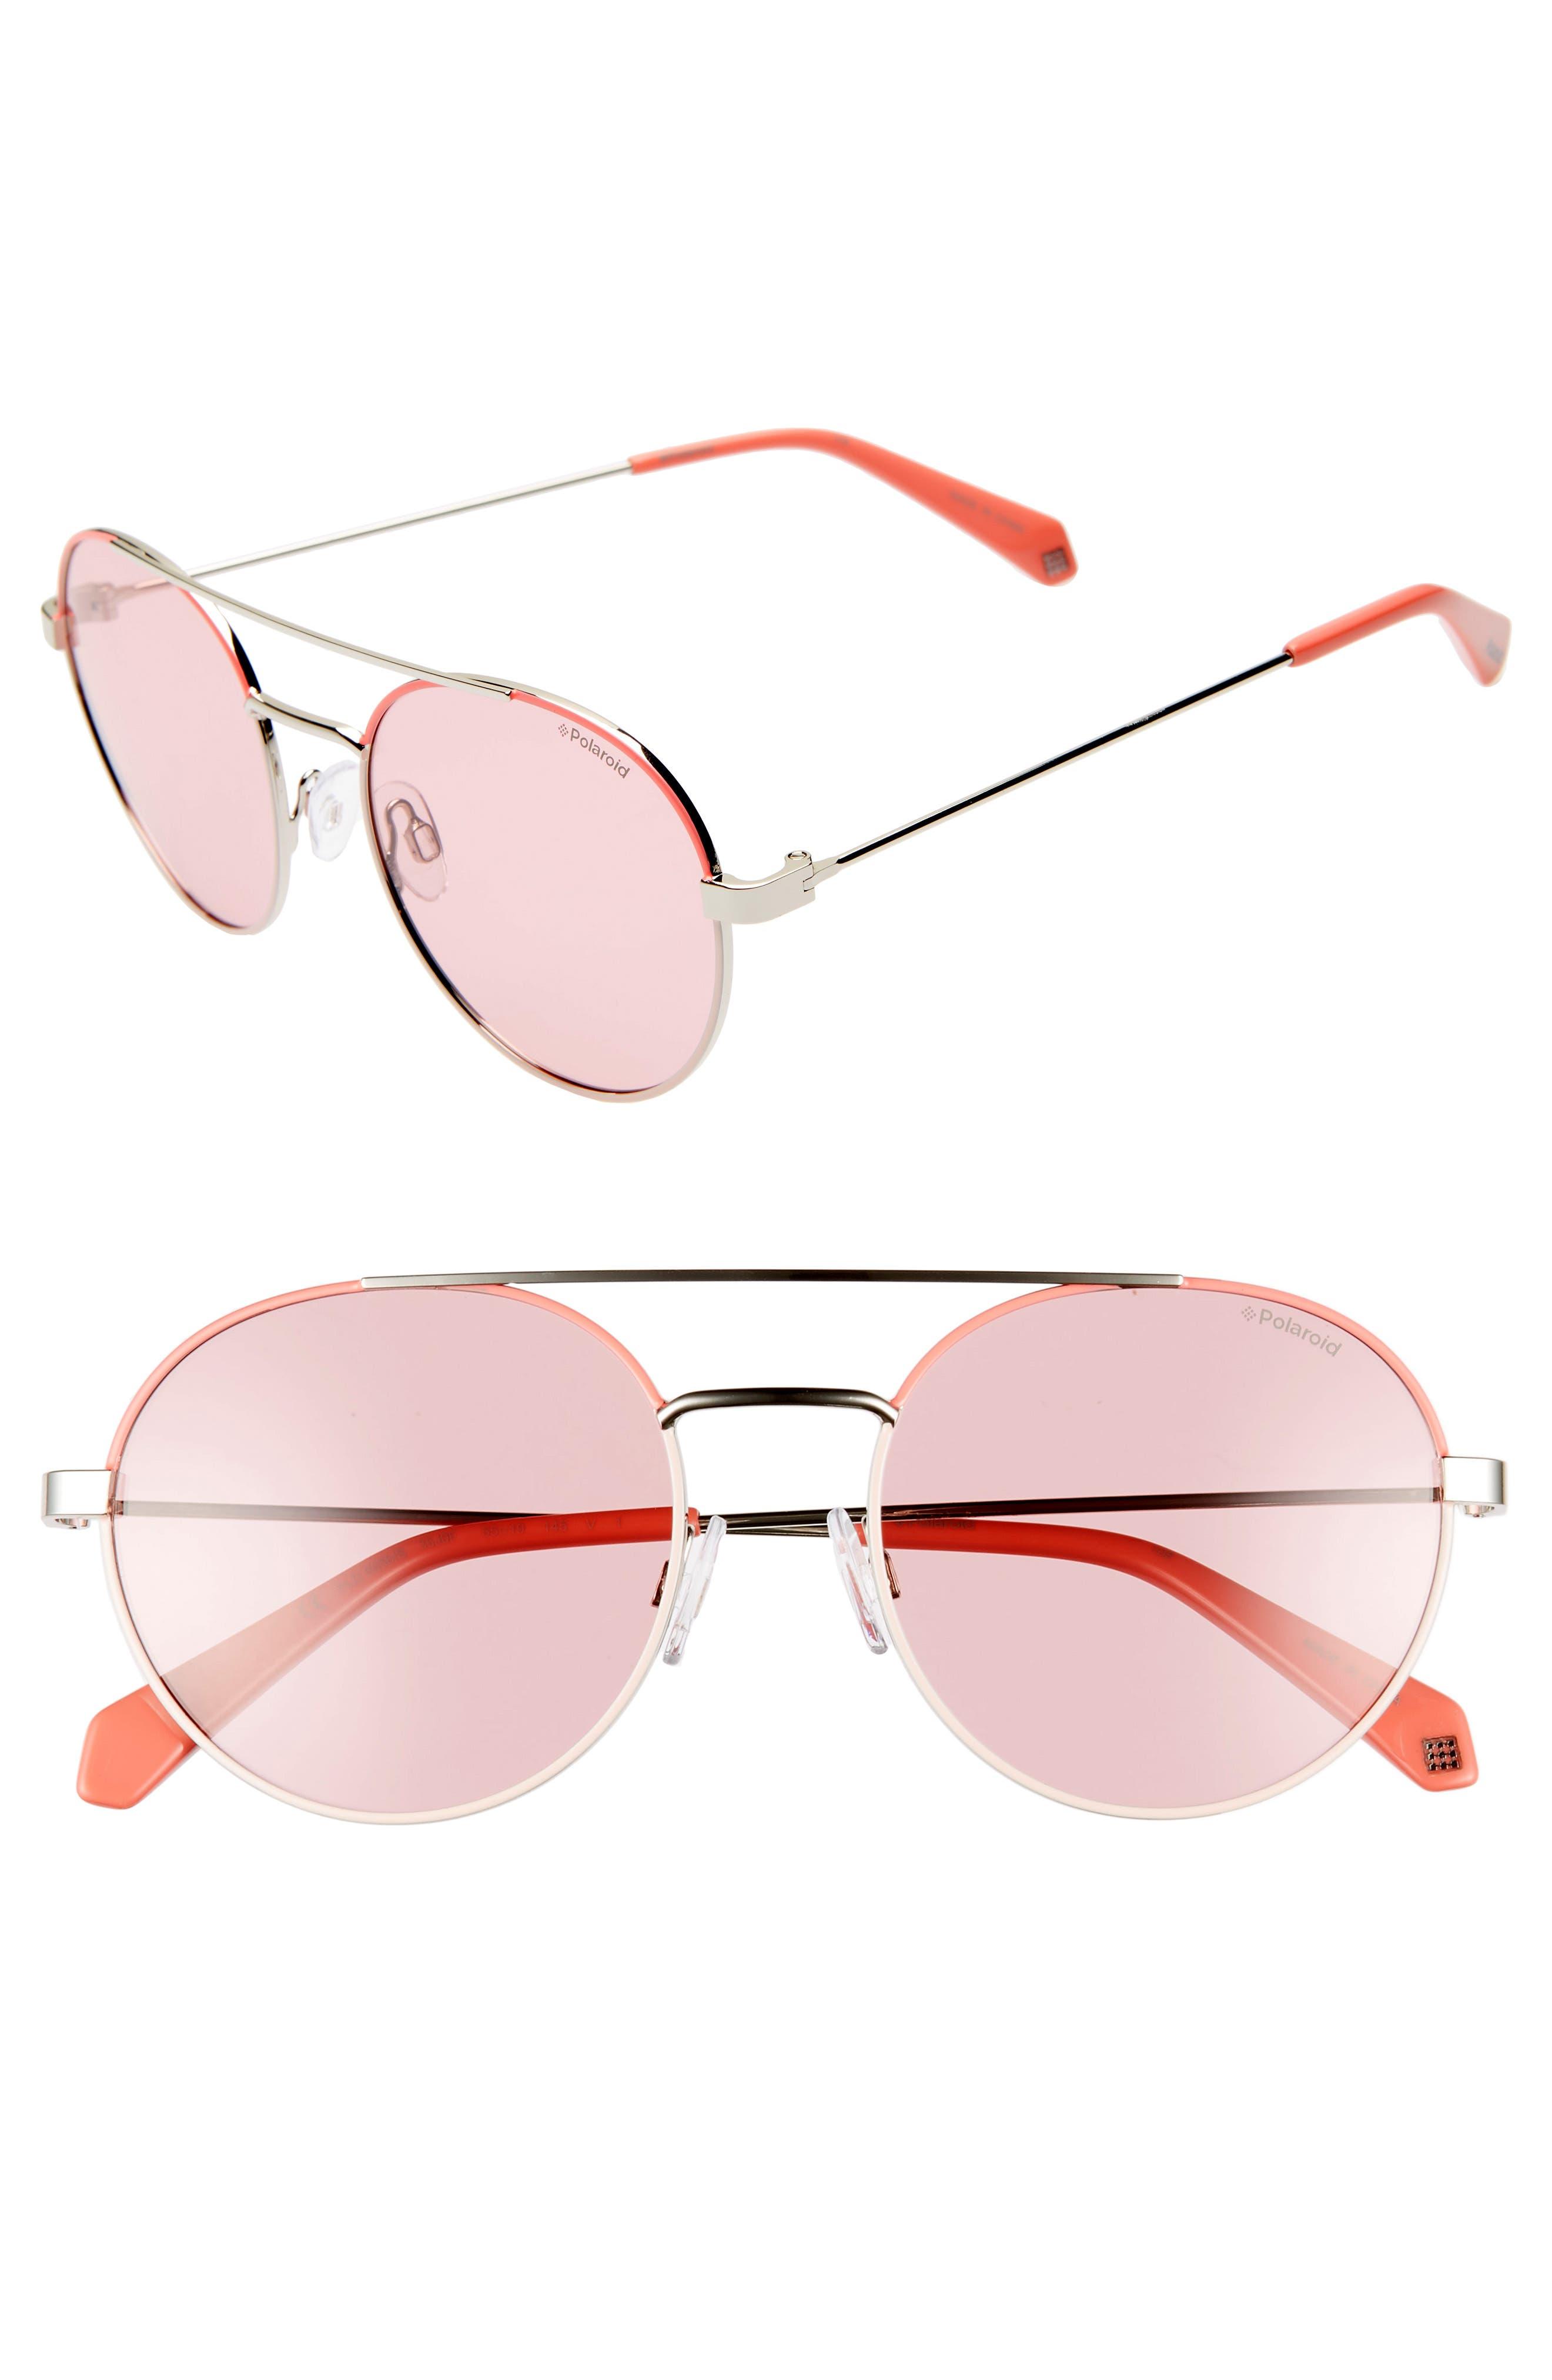 Polaroid 55Mm Polarized Round Aviator Sunglasses - Pink/ Silver